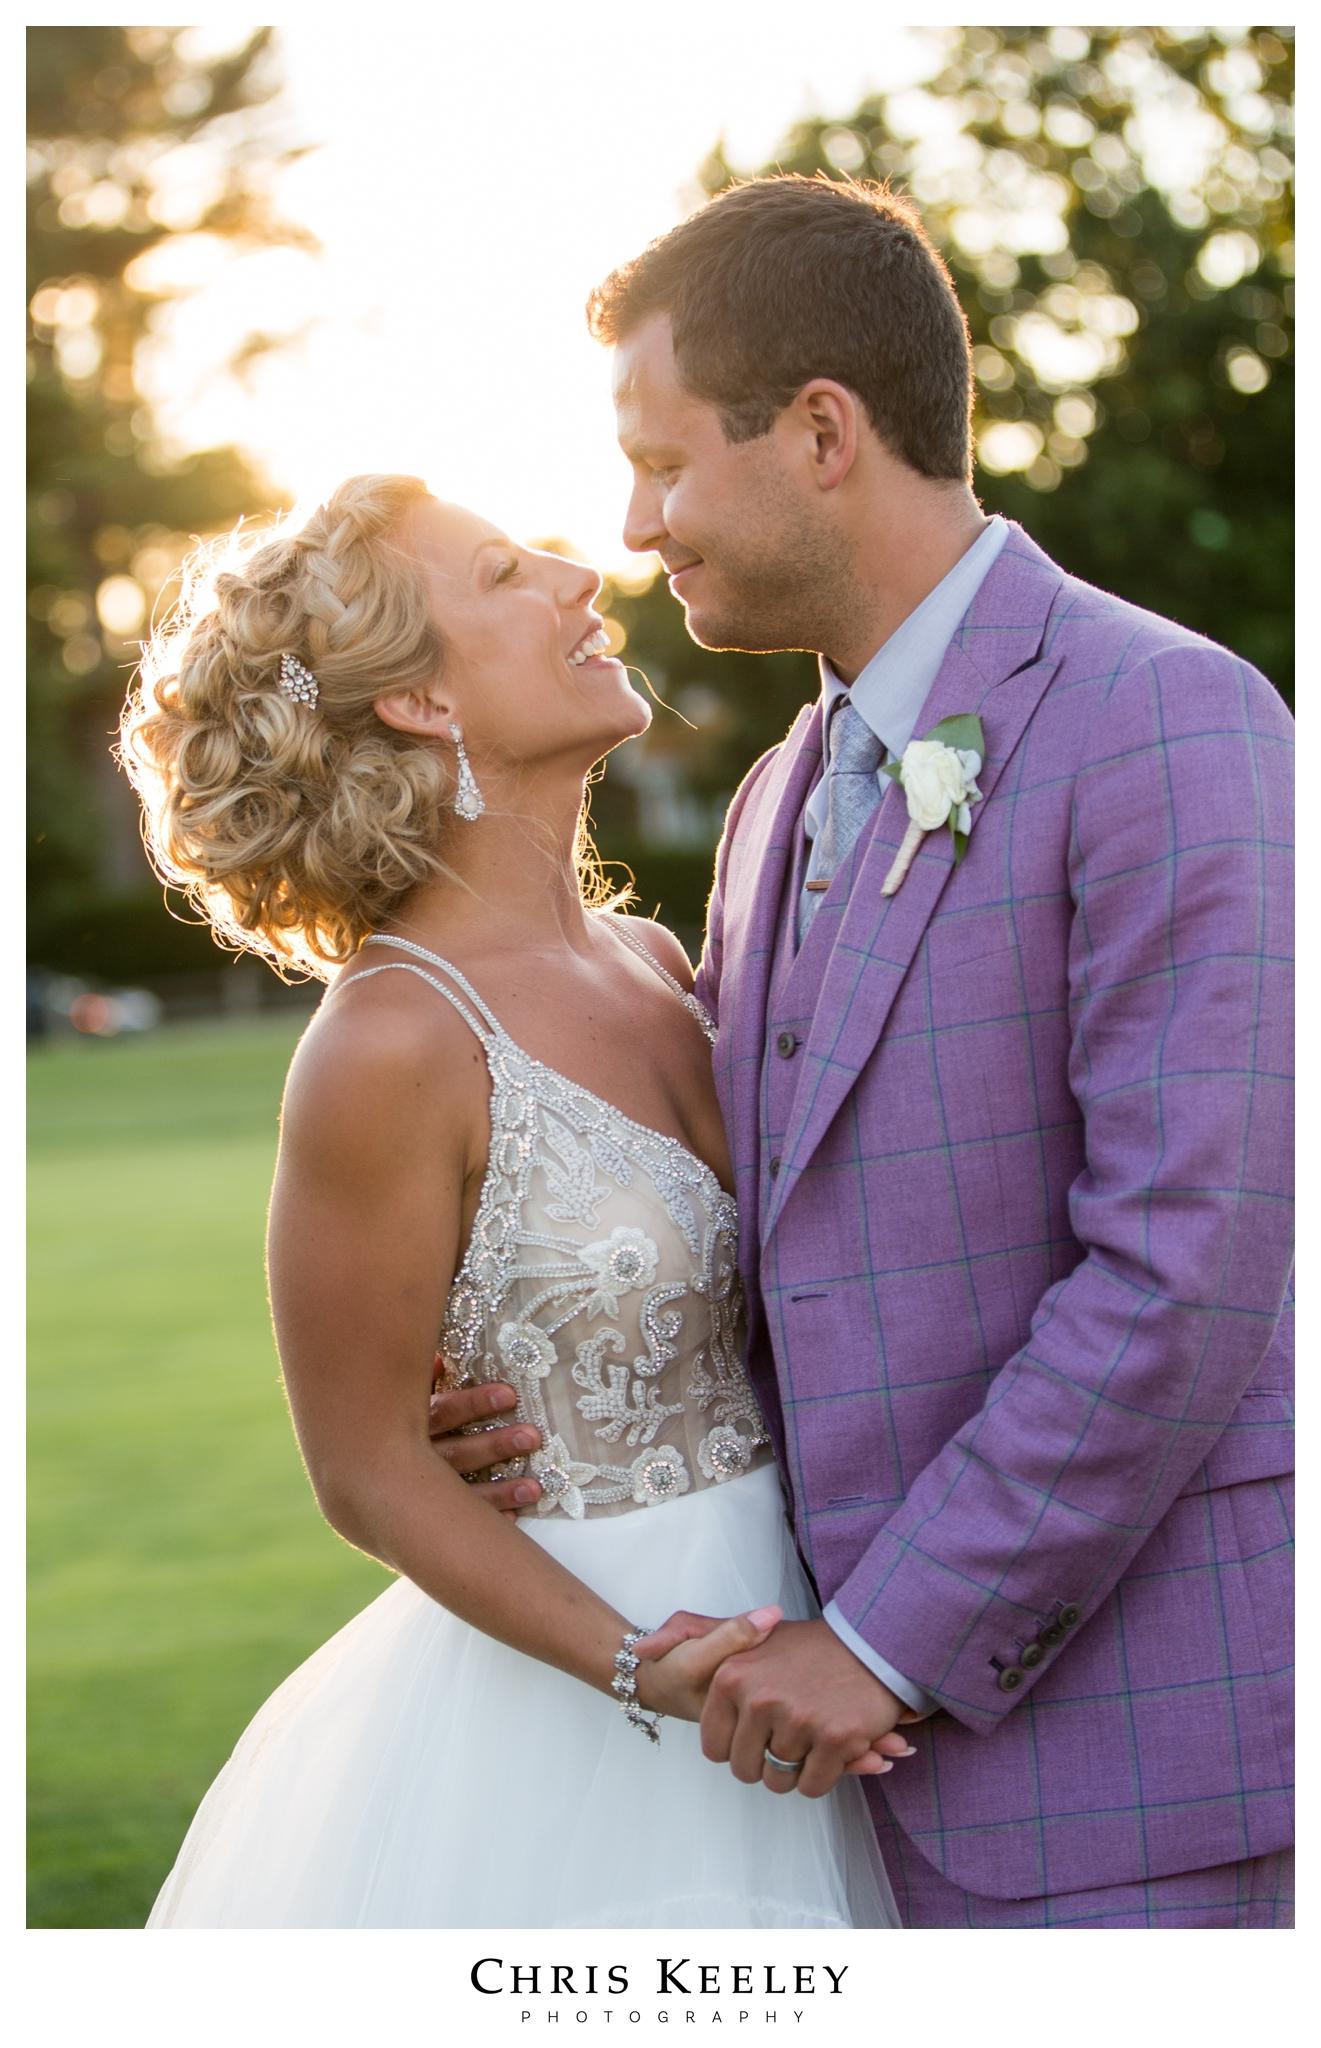 bride-groom-sunset-laughing-candid.jpg